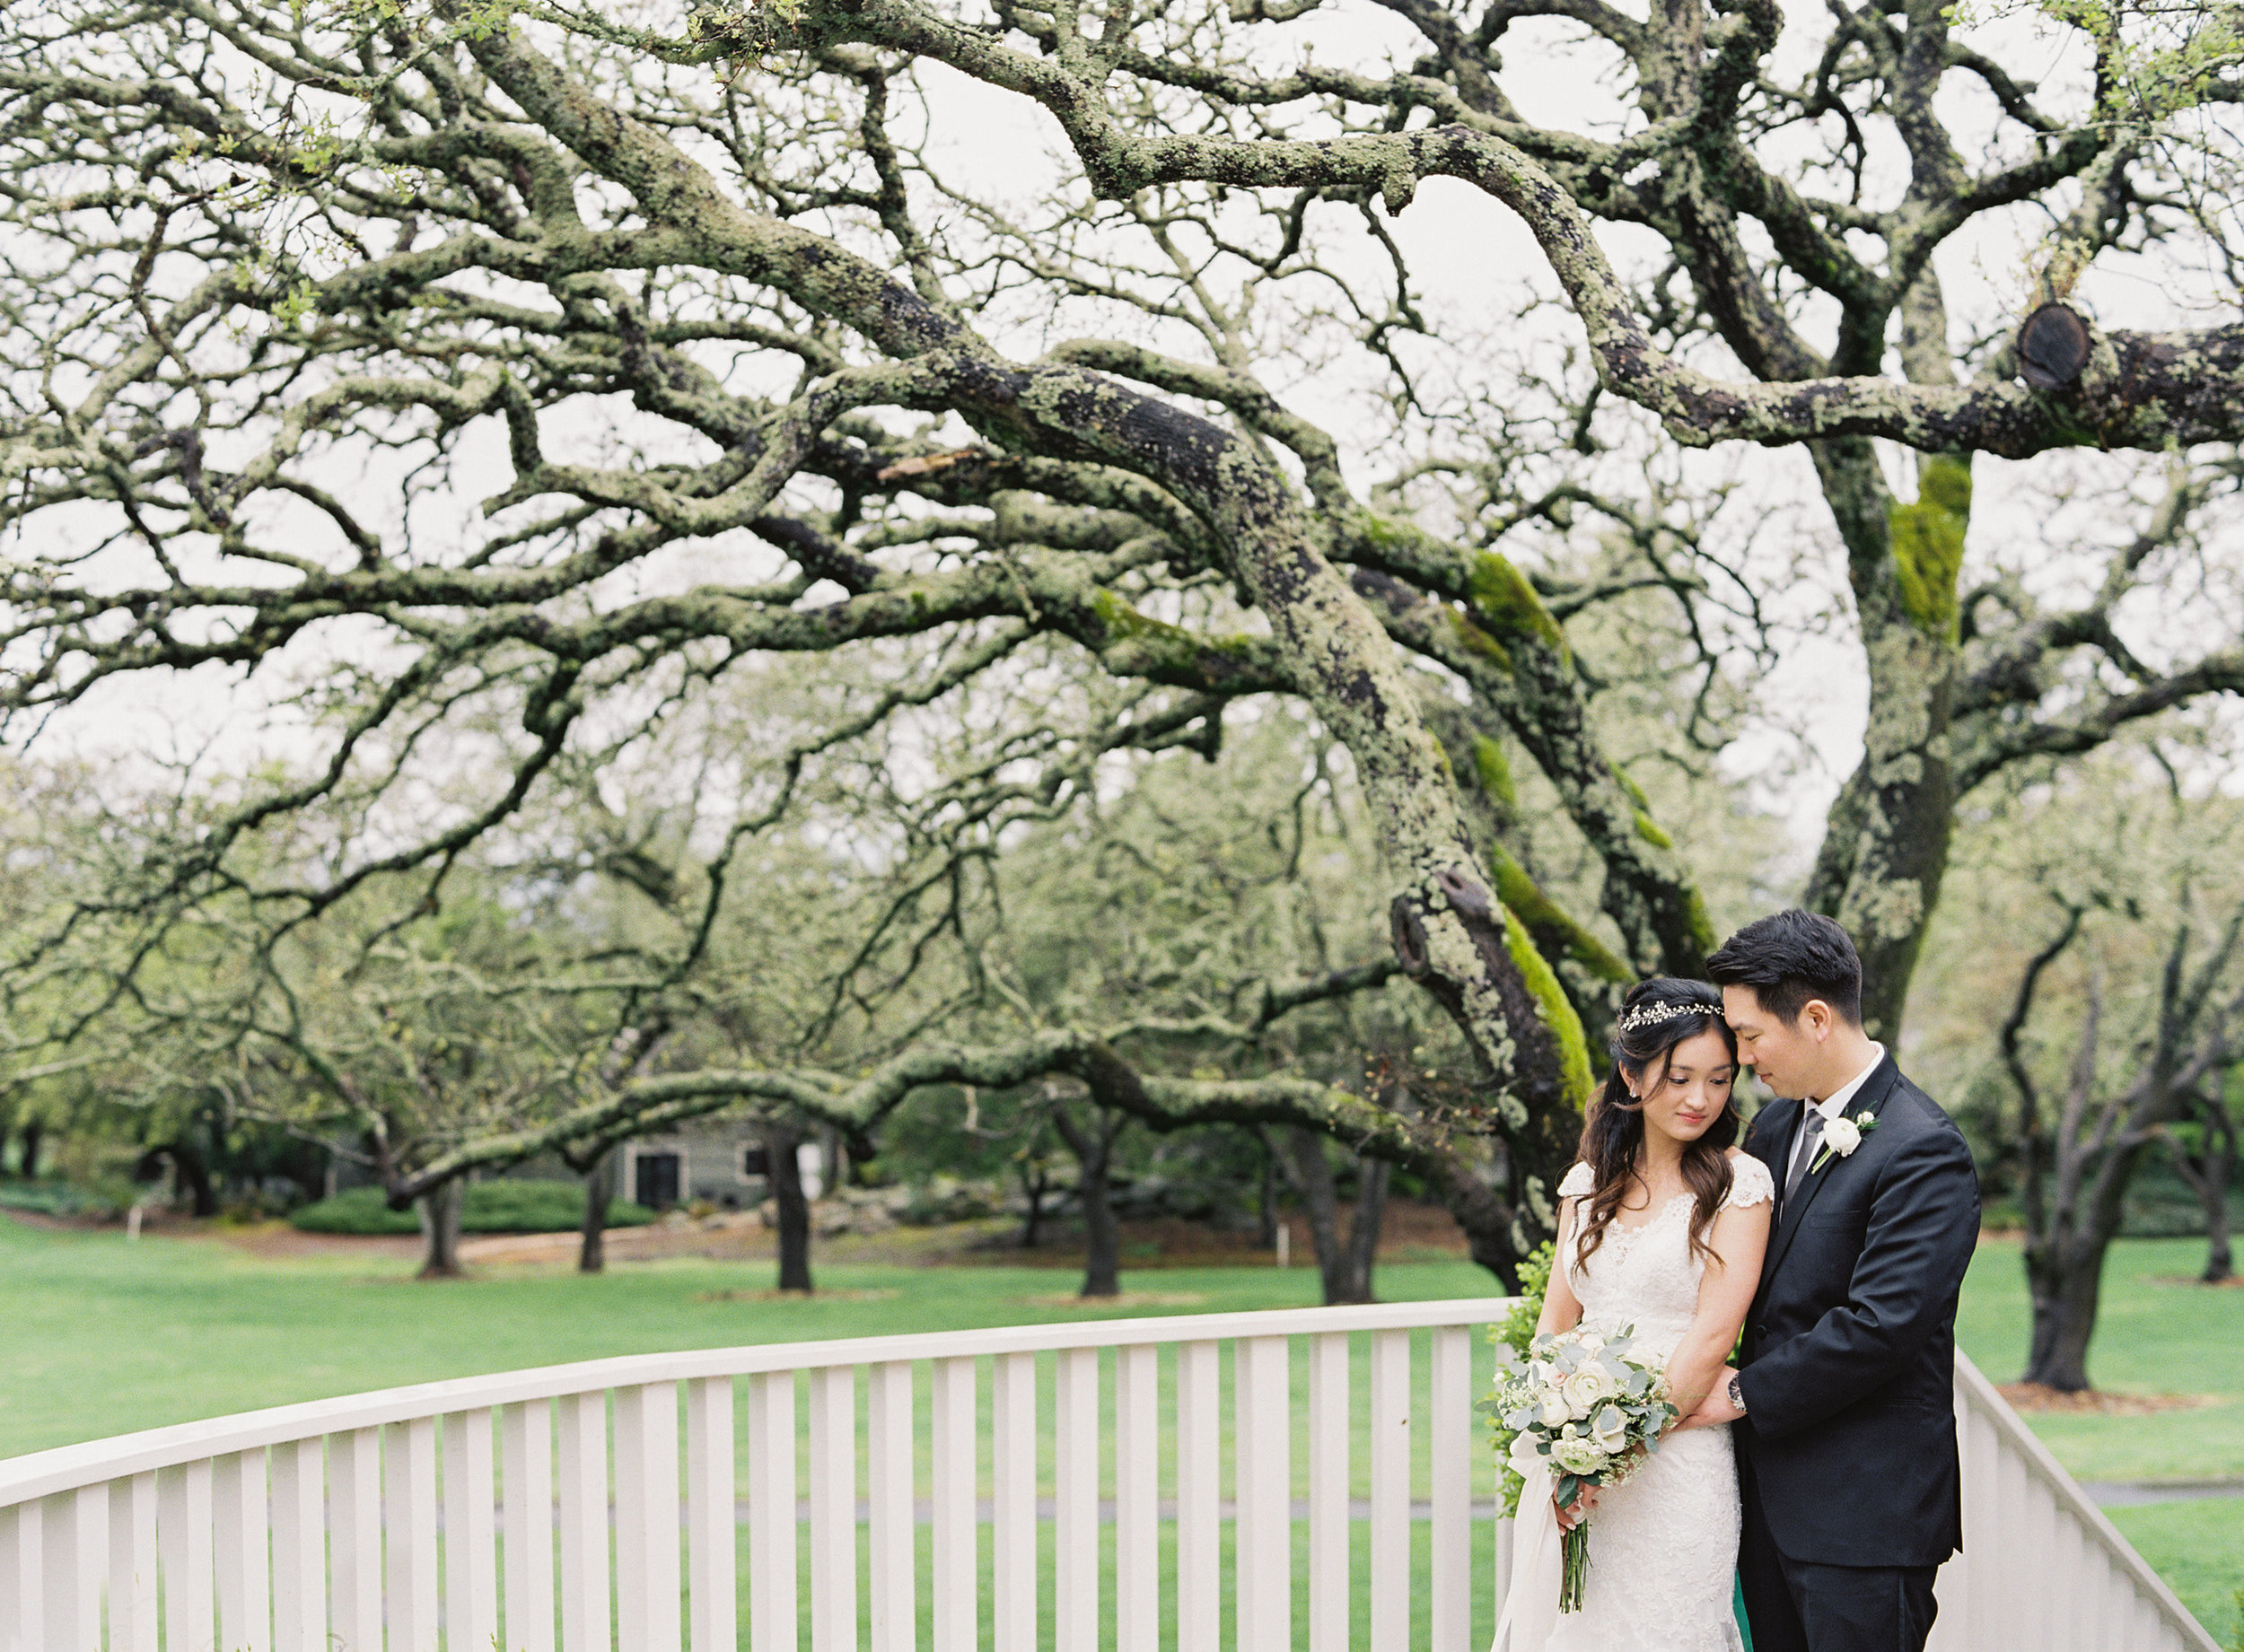 JA_Wedding_Jennifer_Aaron_045.jpg